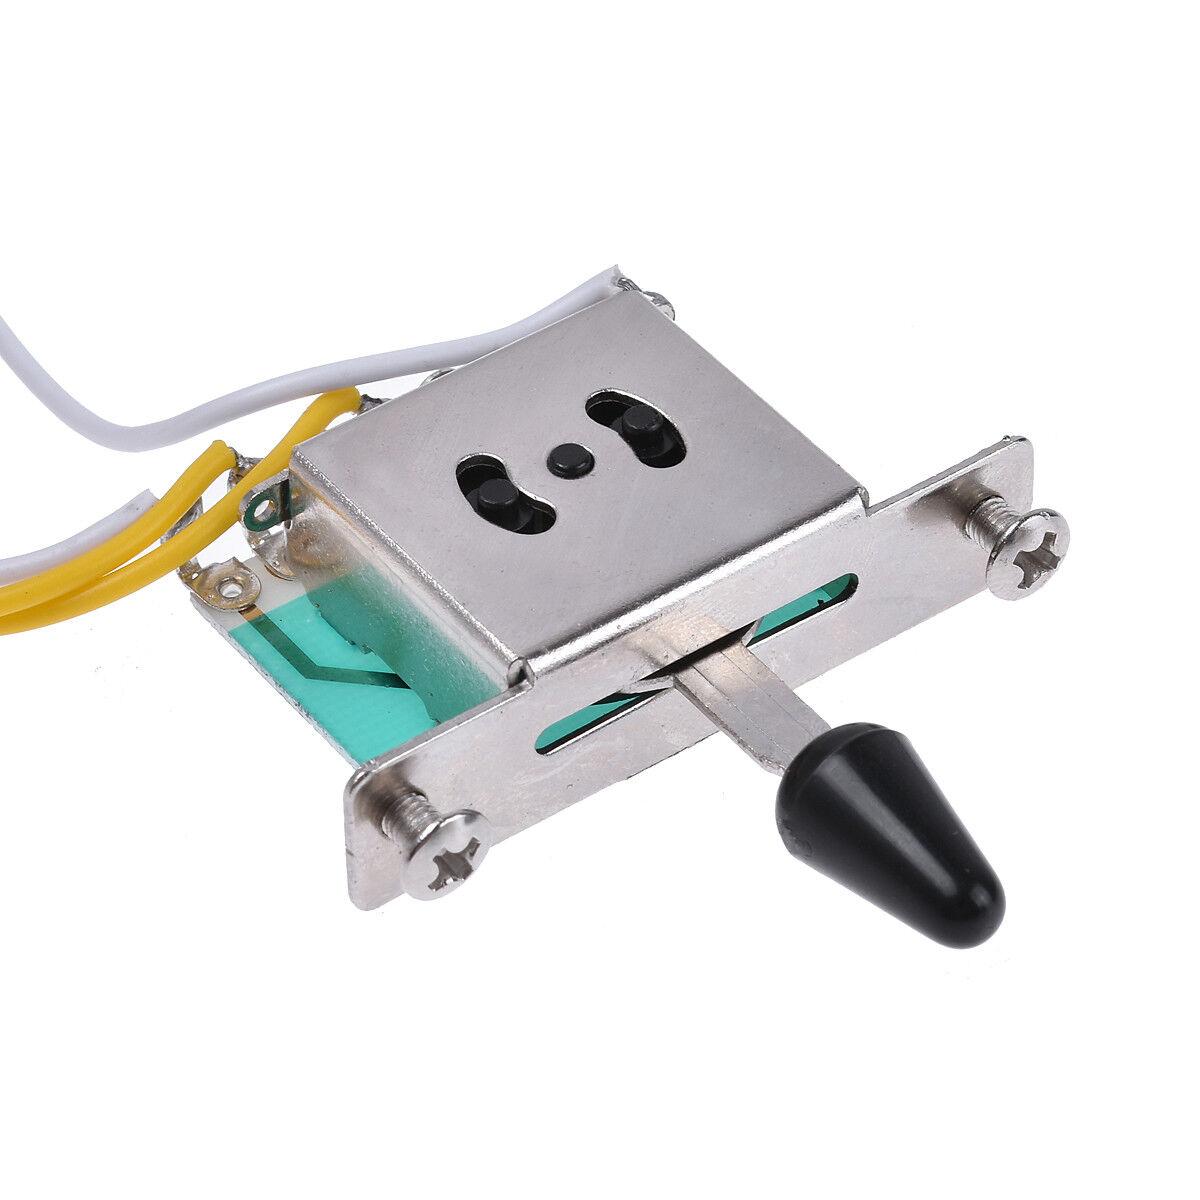 electric guitar wiring harness prewired kit 5 way 250k 2t1v pots for strat parts ebay. Black Bedroom Furniture Sets. Home Design Ideas